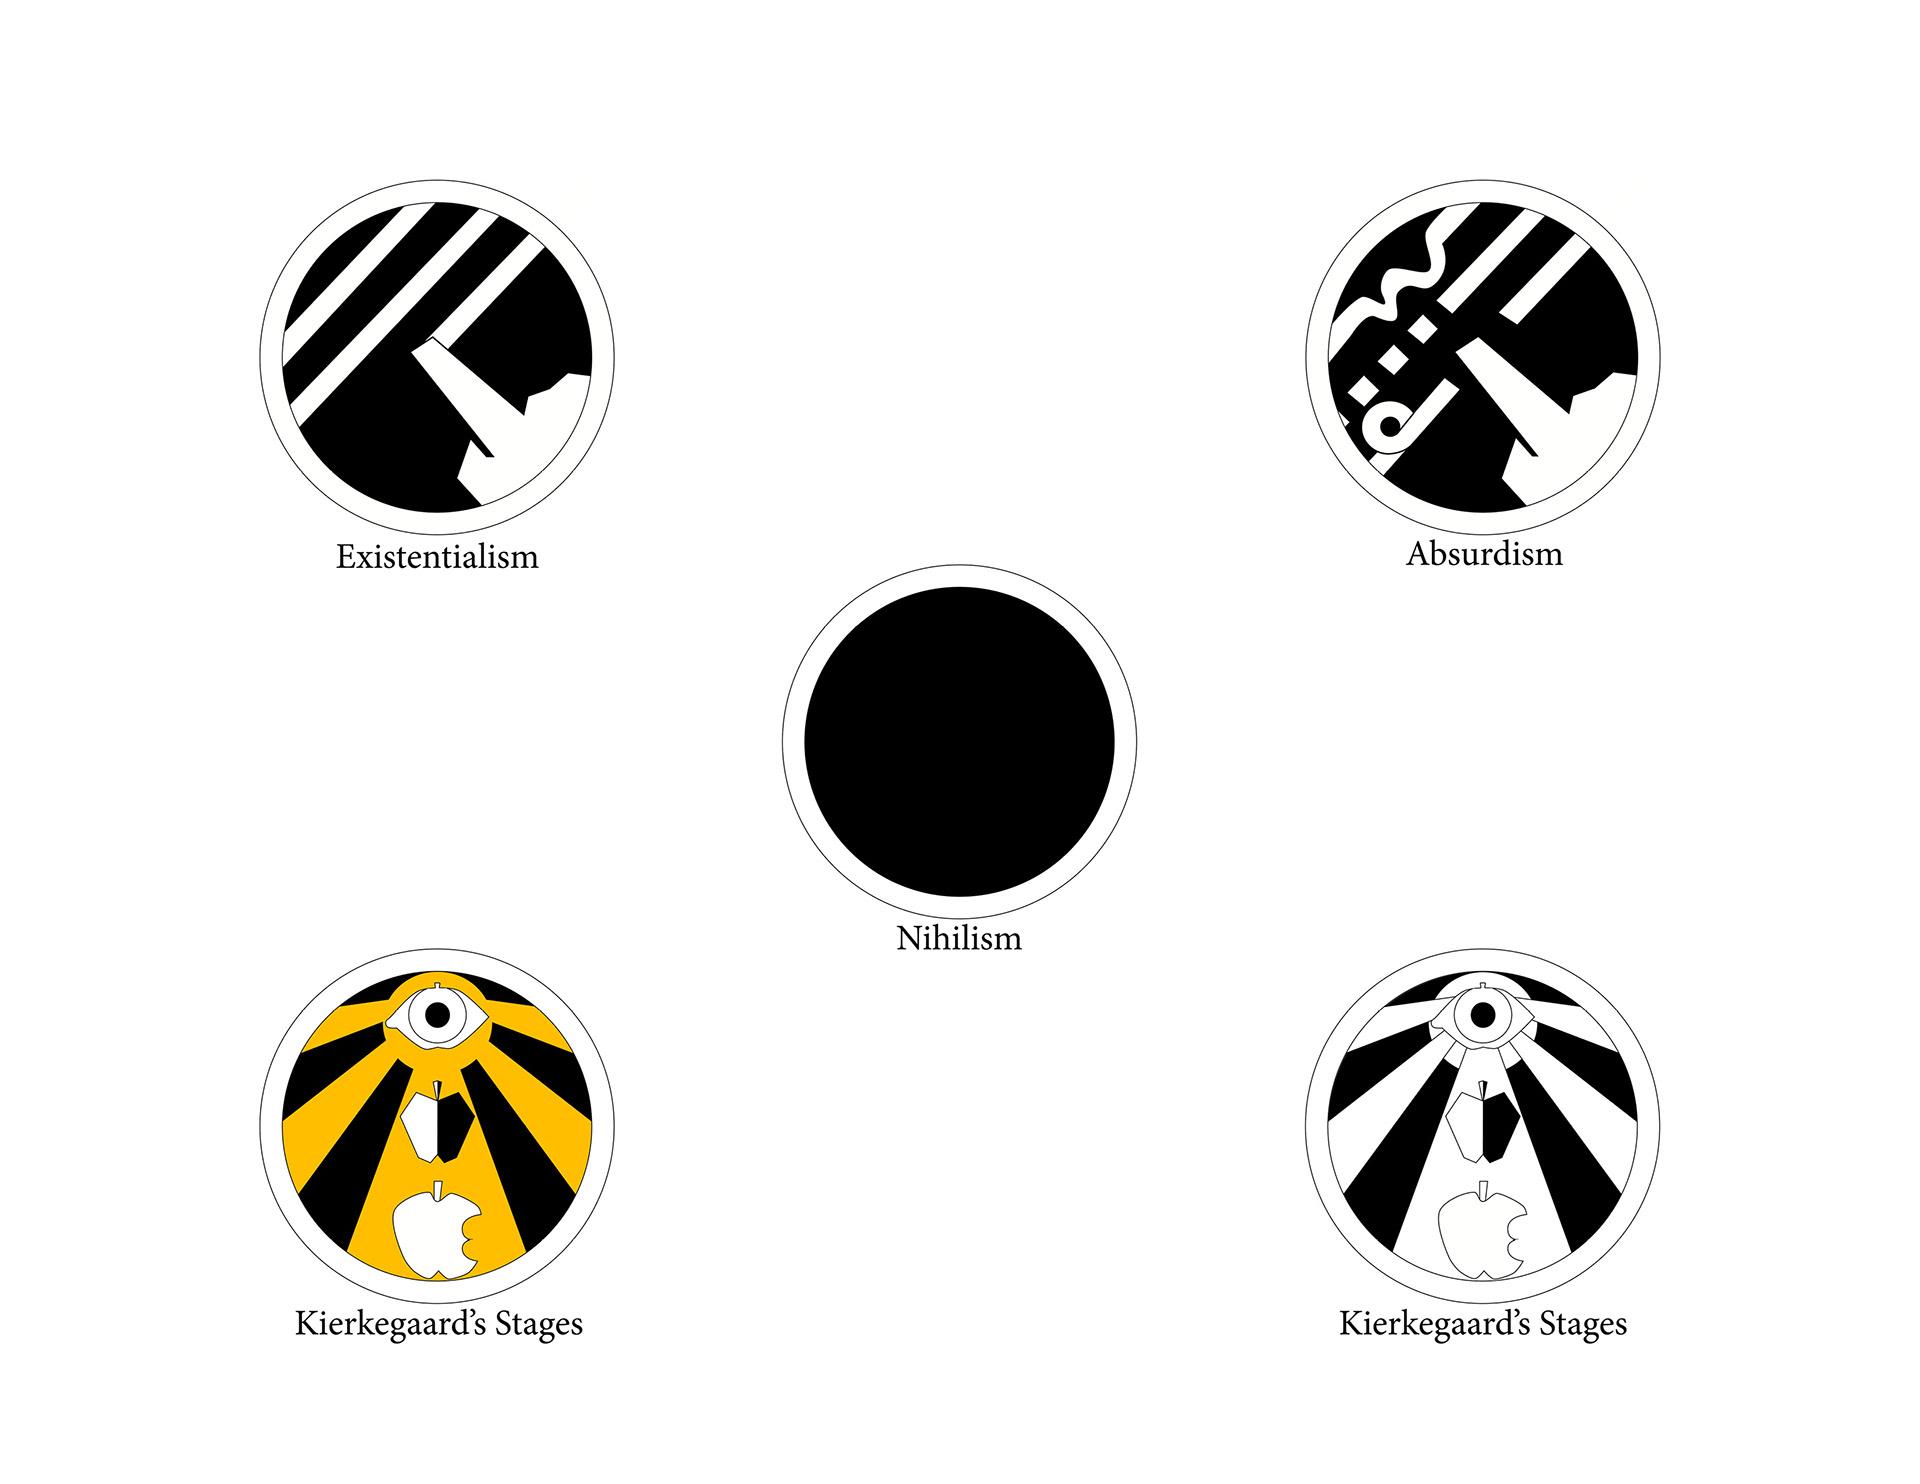 Paul Madsen Existential Symbols